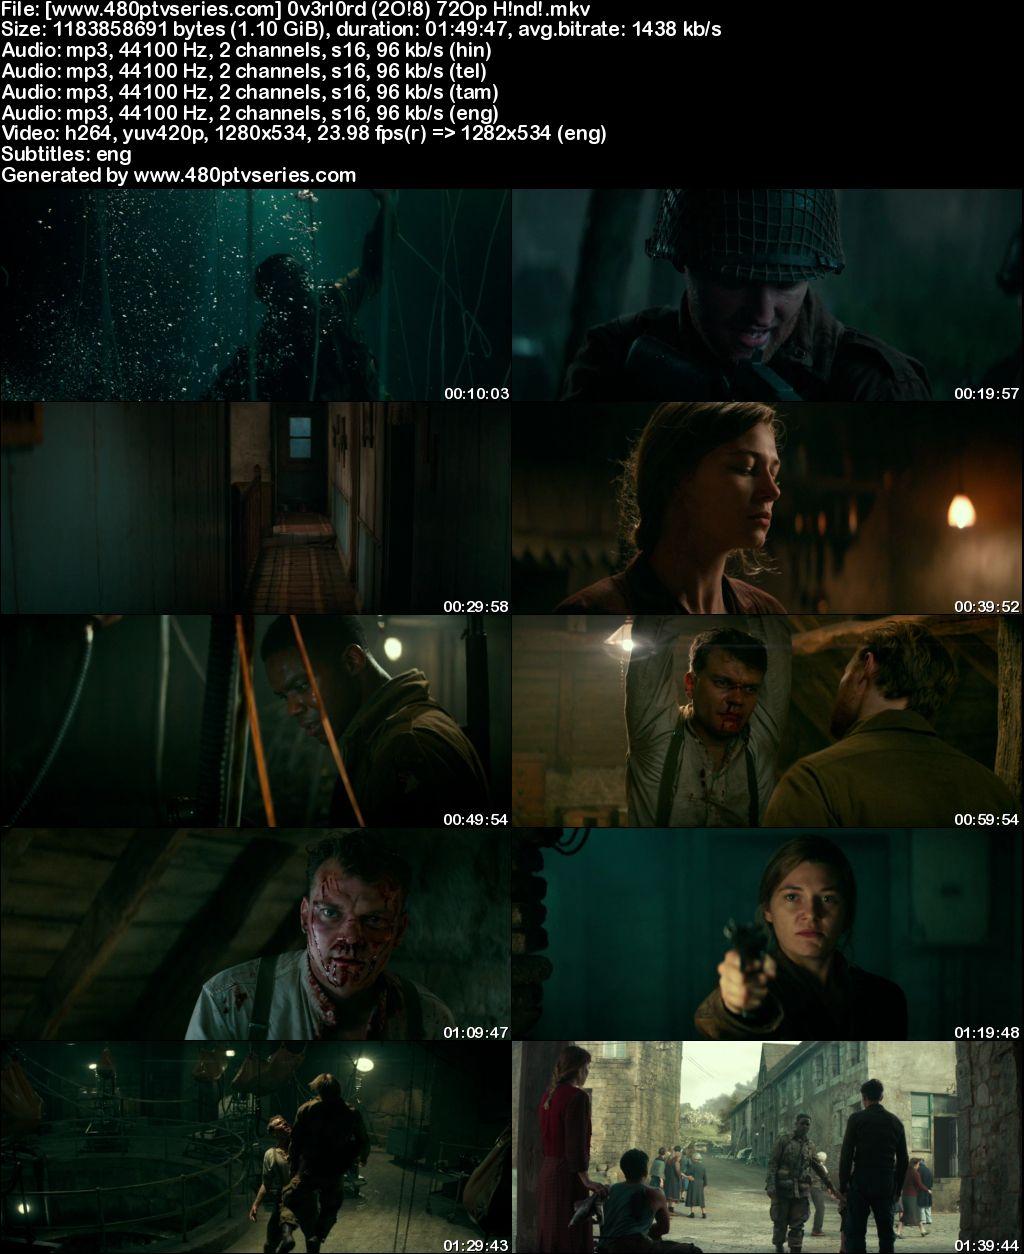 Download Overlord (2018) 1GB Full Hindi Dual Audio Movie Download 720p Bluray Free Watch Online Full Movie Download Worldfree4u 9xmovies